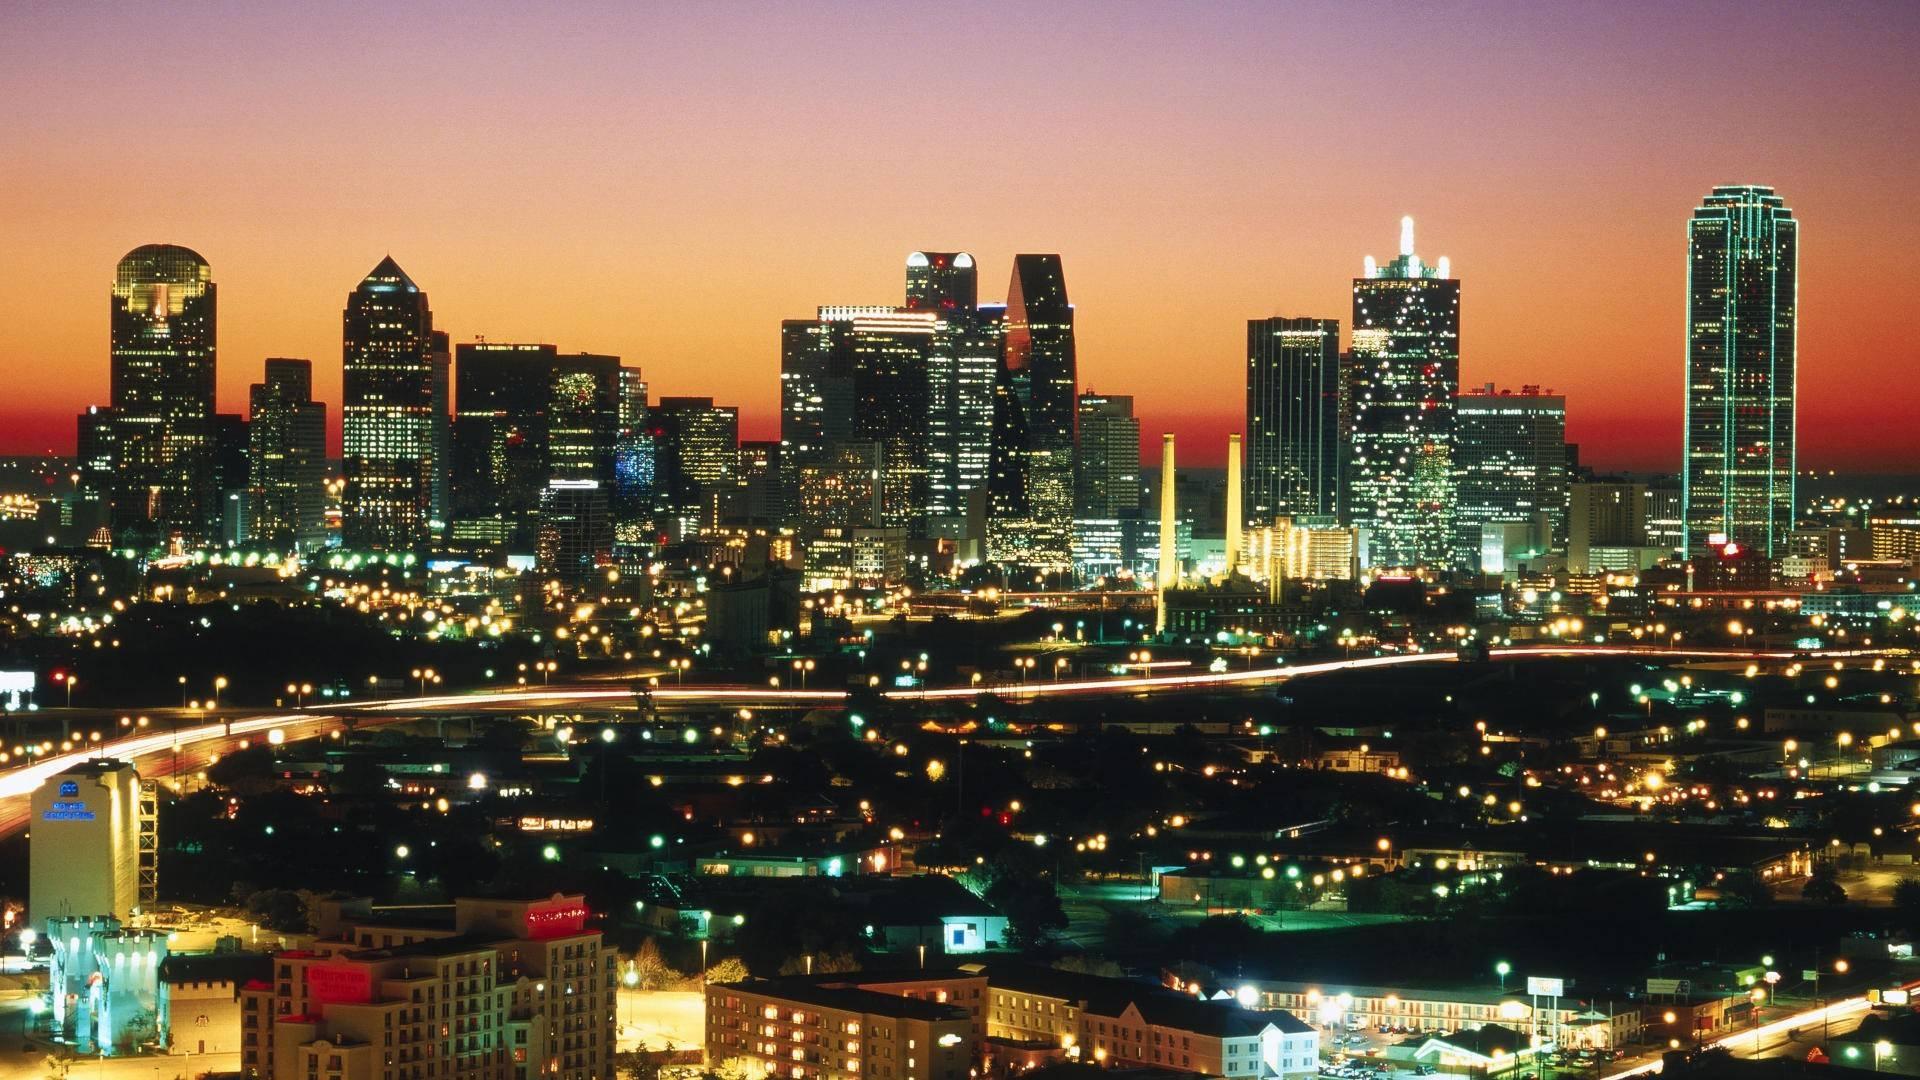 Inspirational Quotes Wallpaper Desktop Dallas Wallpapers Hd Free Download Pixelstalk Net